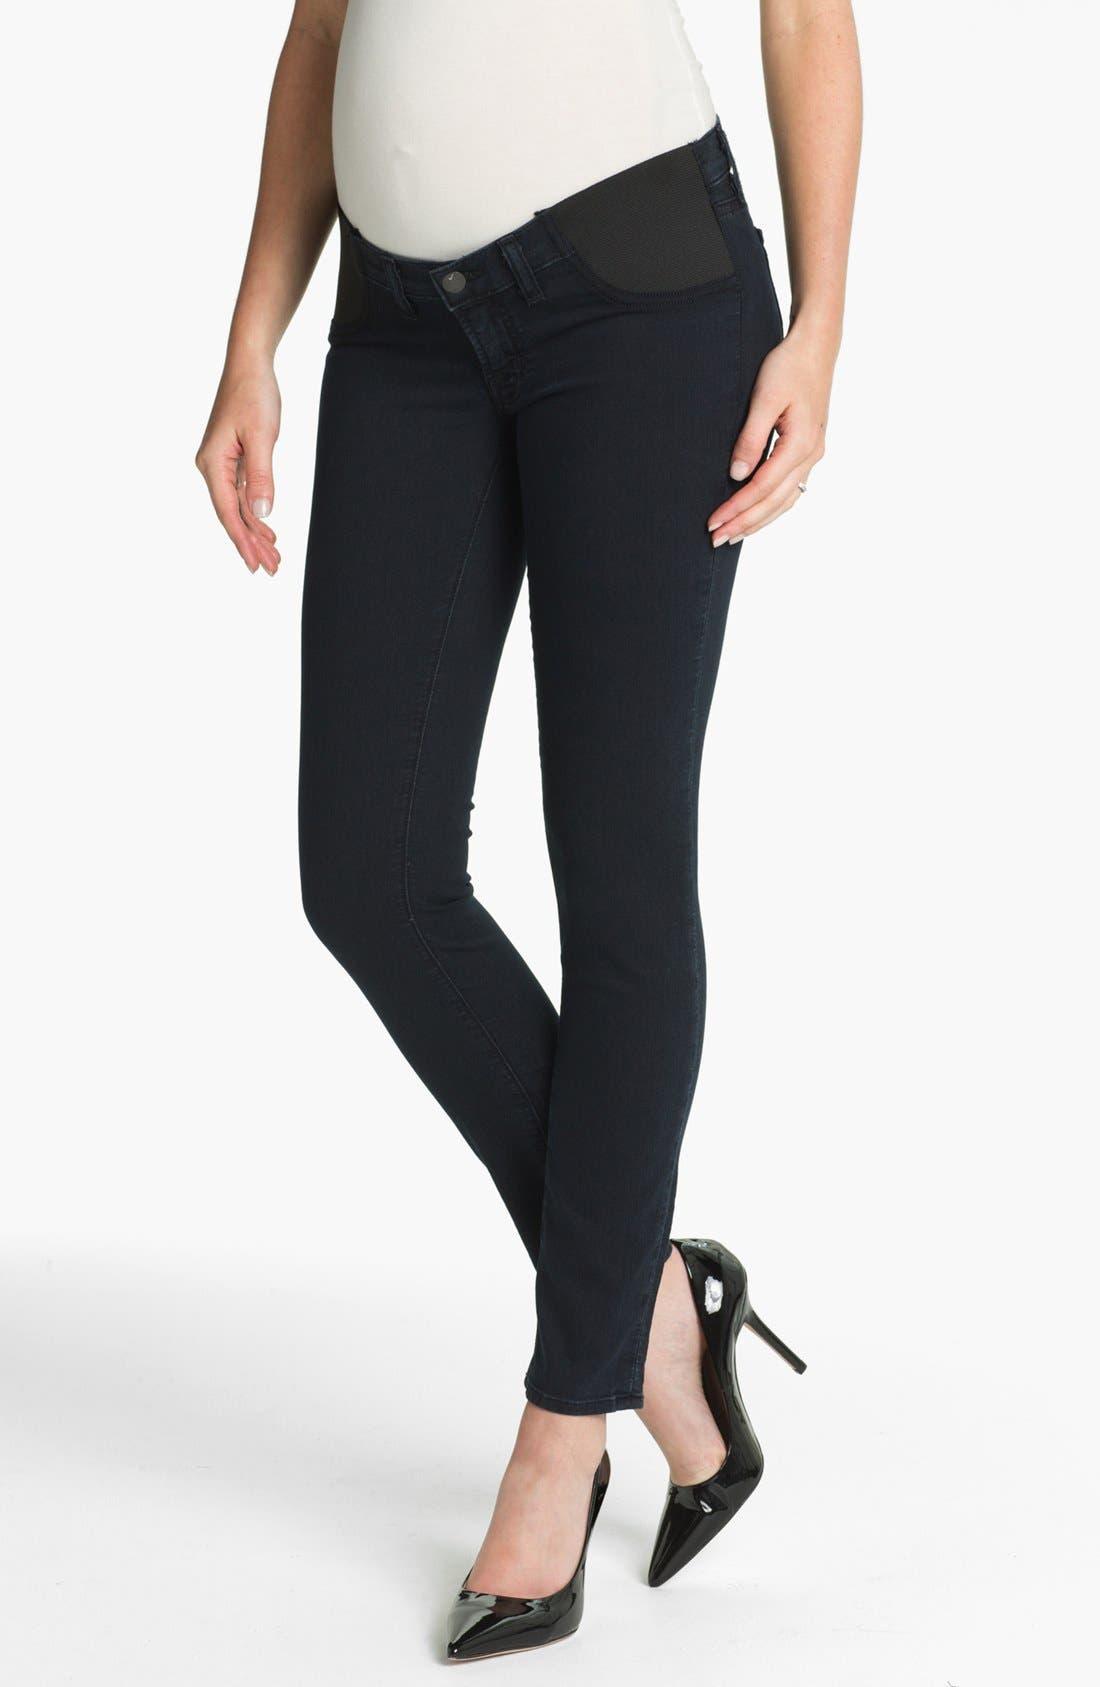 Alternate Image 1 Selected - J Brand Denim Maternity Leggings (Olympia)